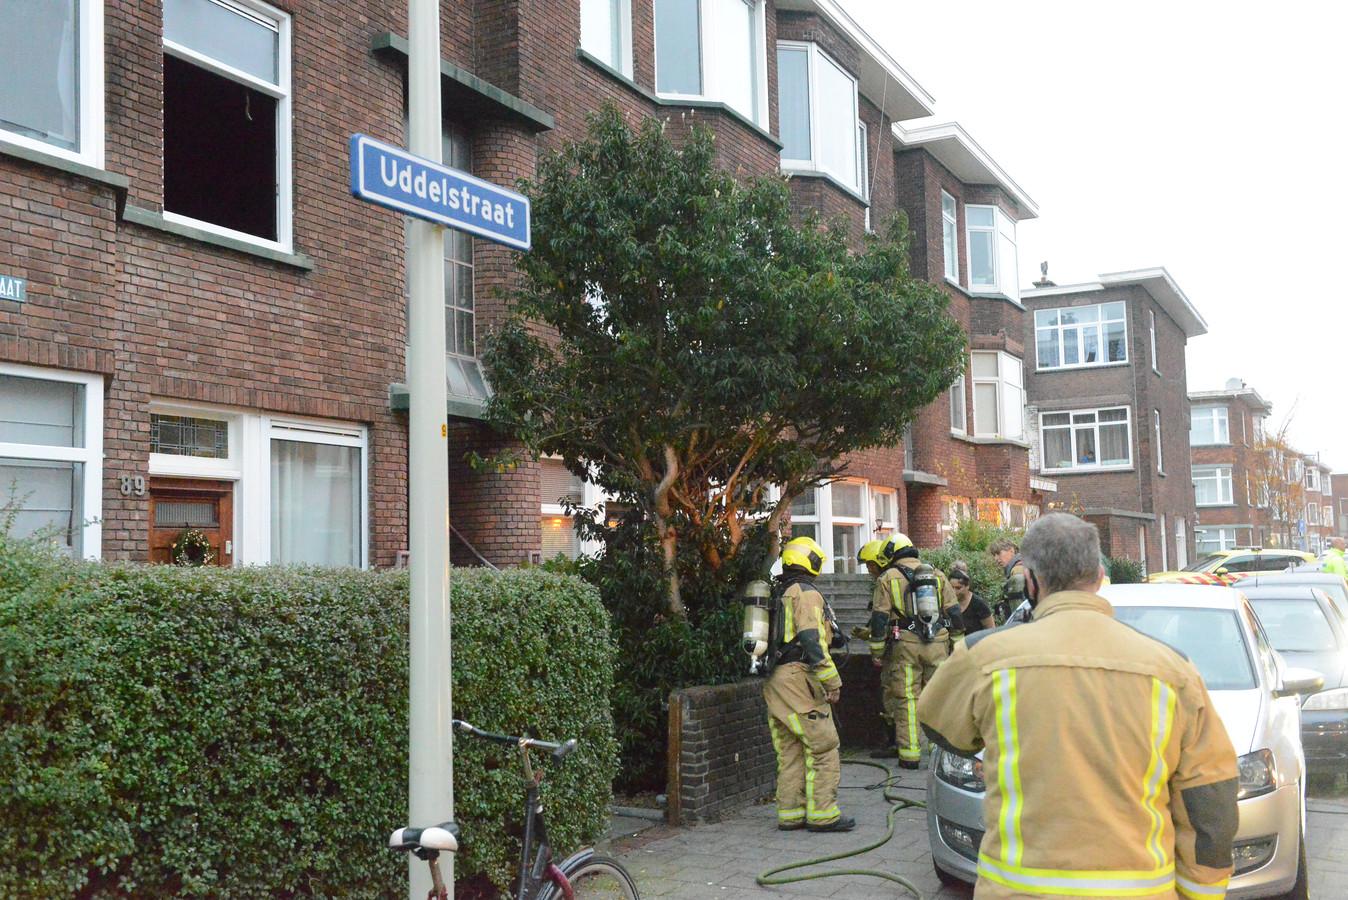 Brand in Uddelstraat